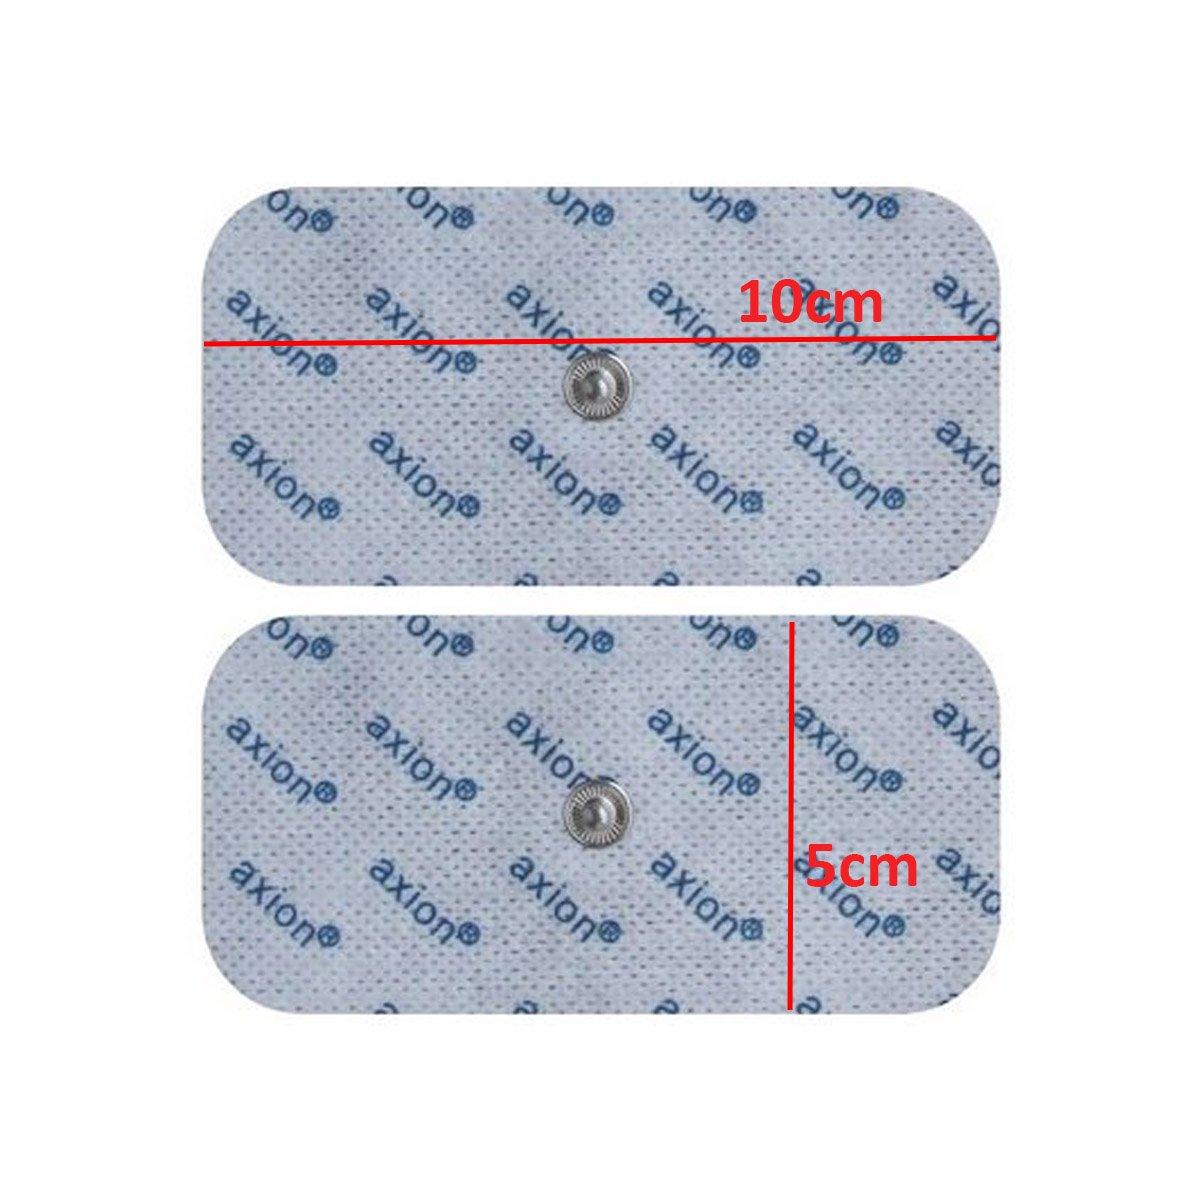 qualit/à axion 12 Elettrodi dispositivi BEURER SANITAS Pads TENS EMS 10X5CM Attacco universale a bottone da 3.5mm